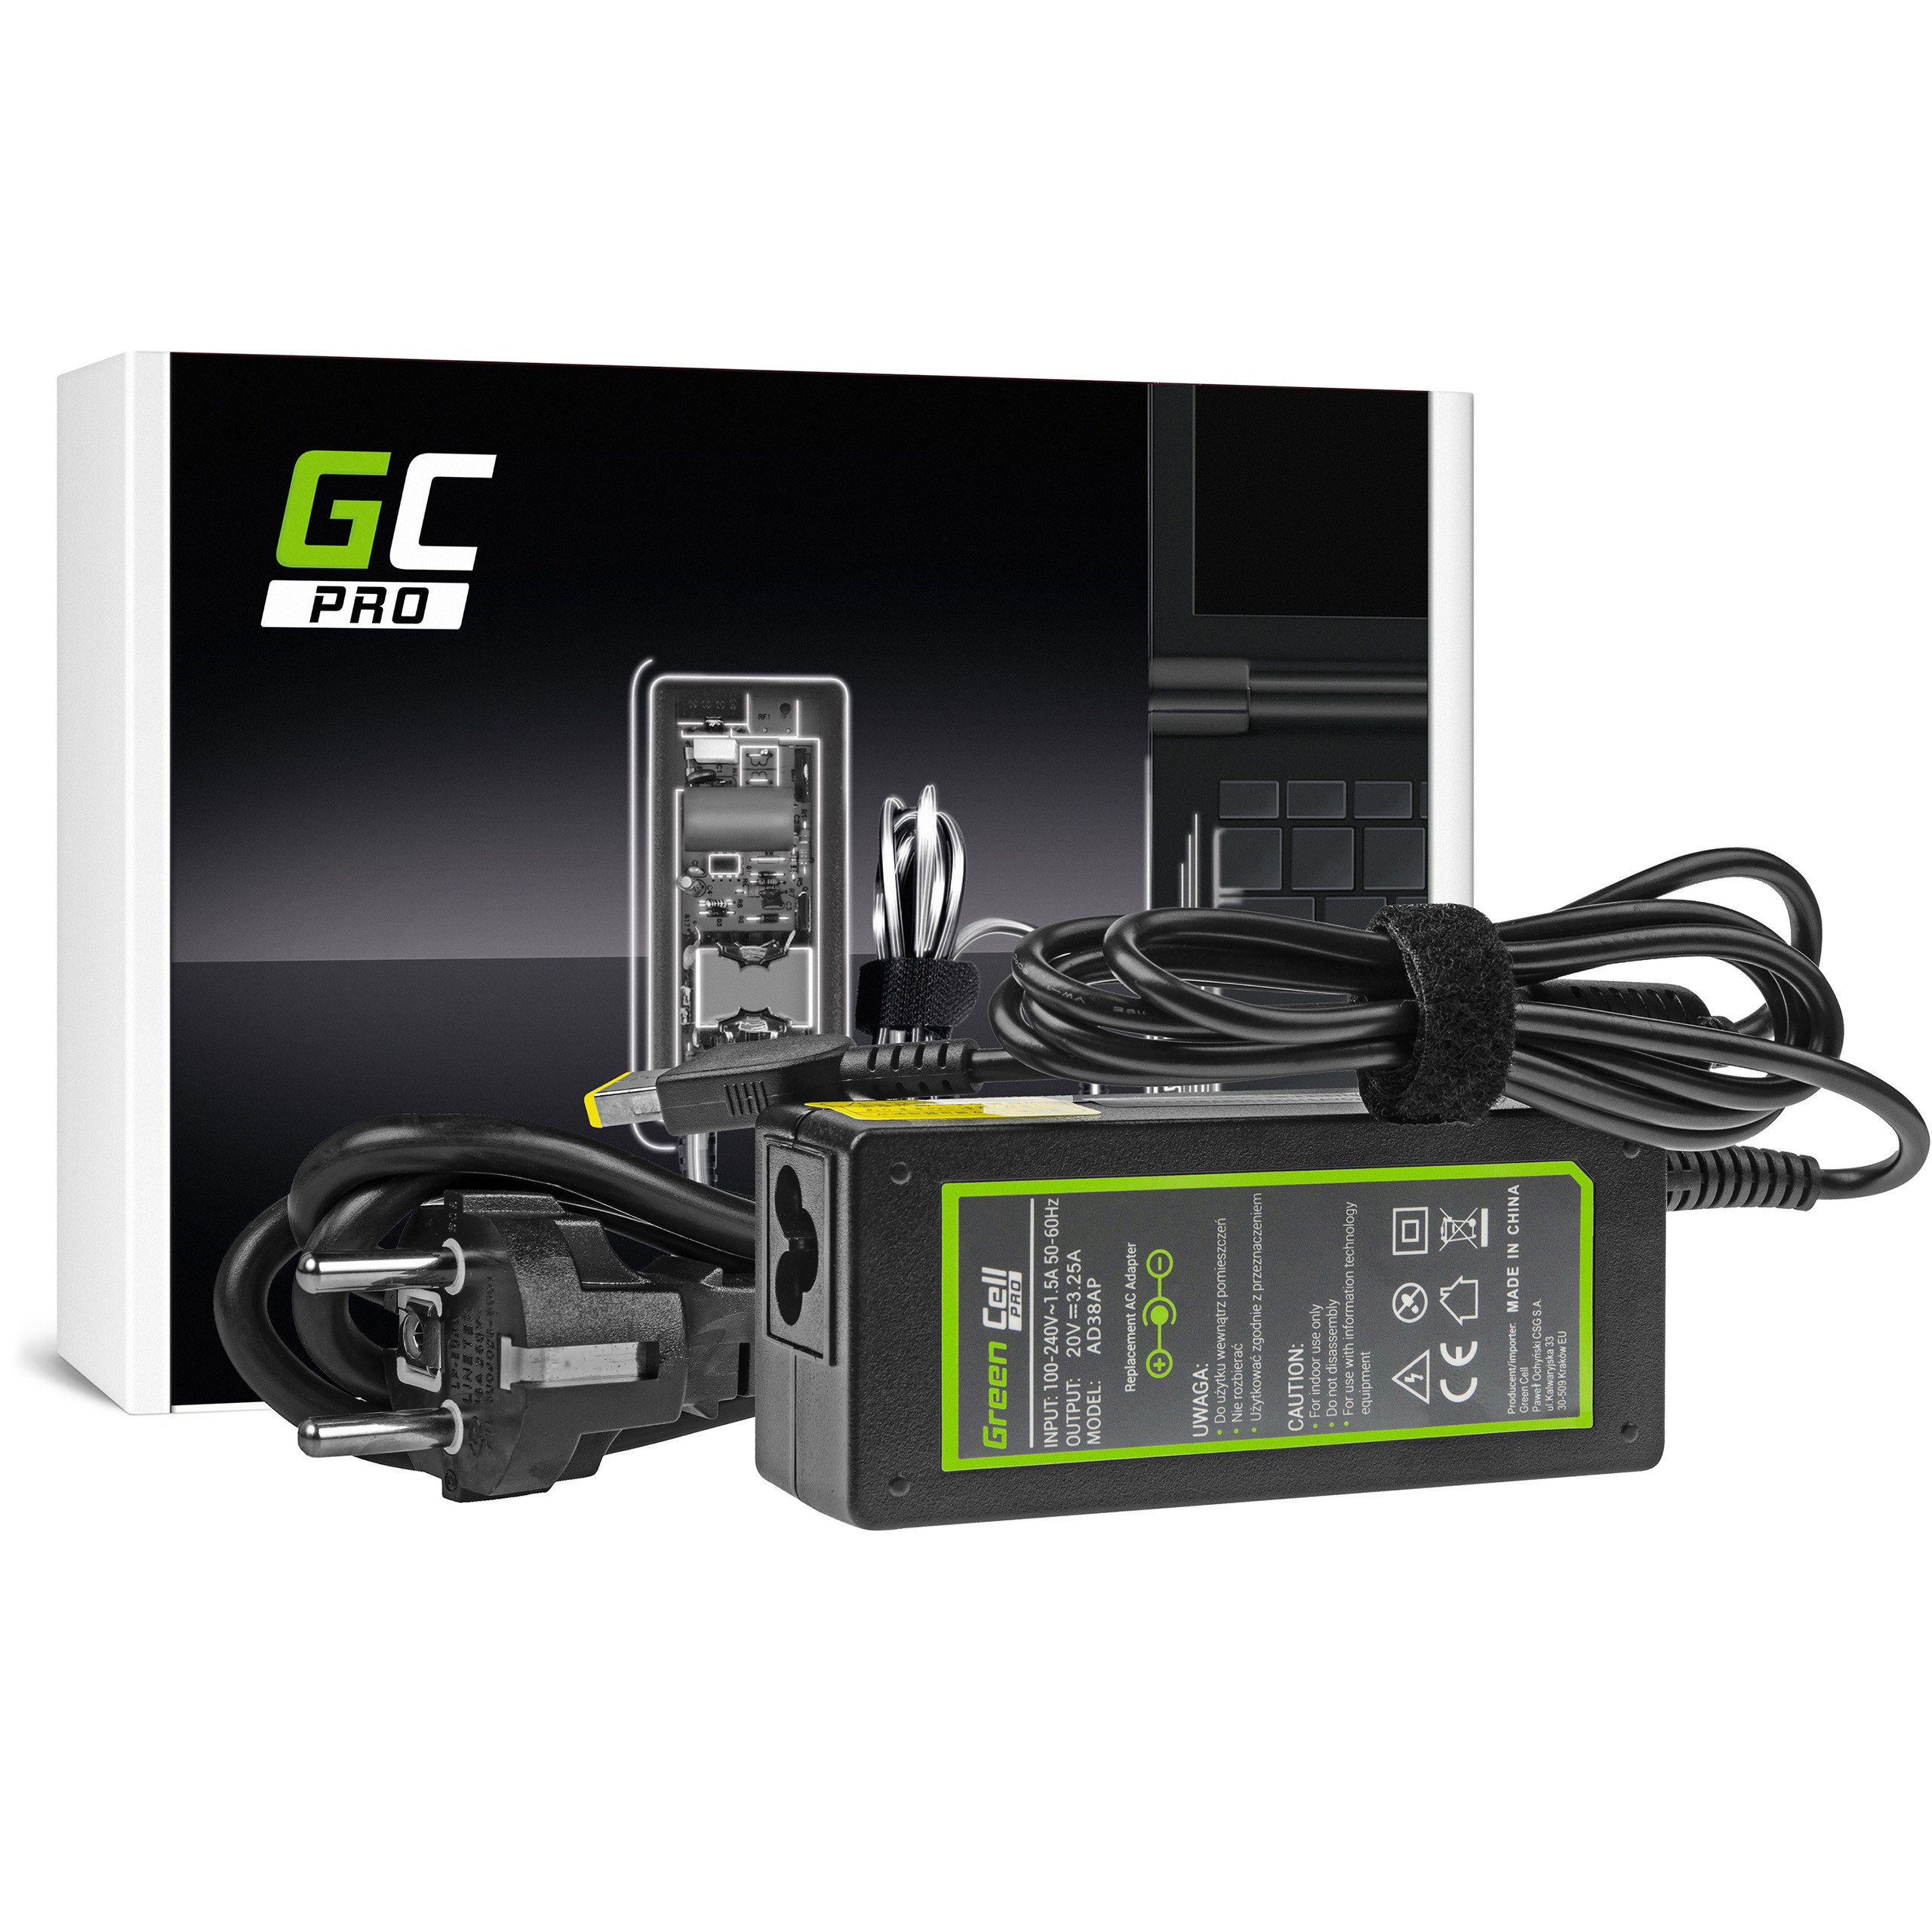 Green Cell AD38AP Adaptér Nabíječka Lenovo B50 G50 G50-30 G50-45 G50-70 G50-80 G500 G500s G505 G700 G710 Z50-70 20V 3.25A 65W